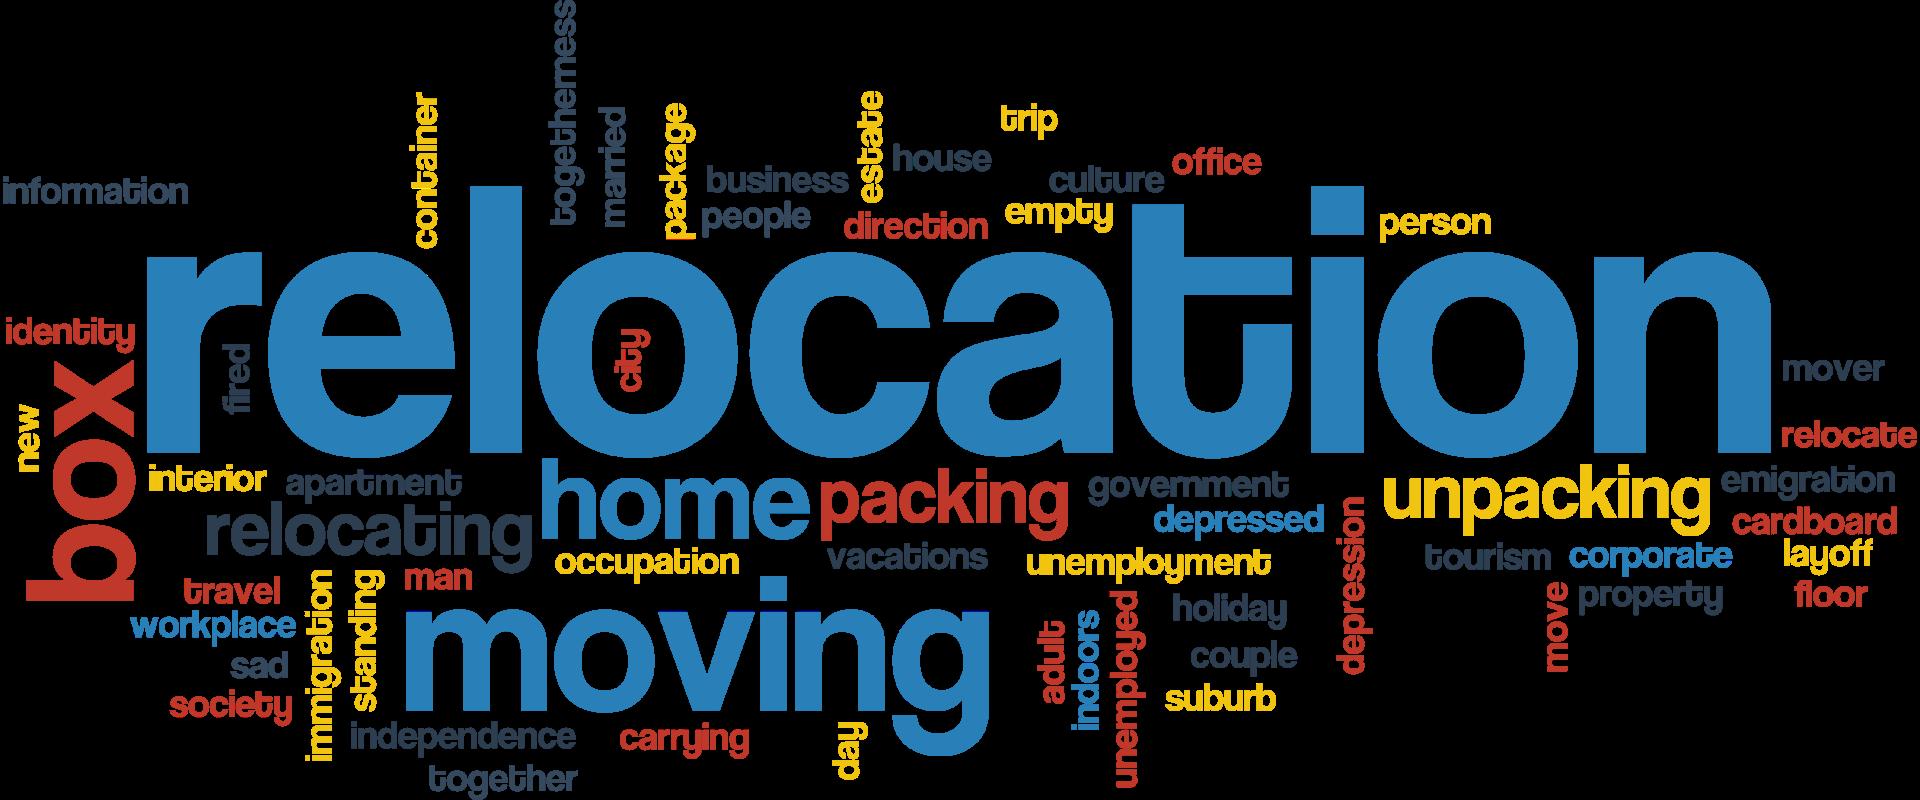 relocation-4